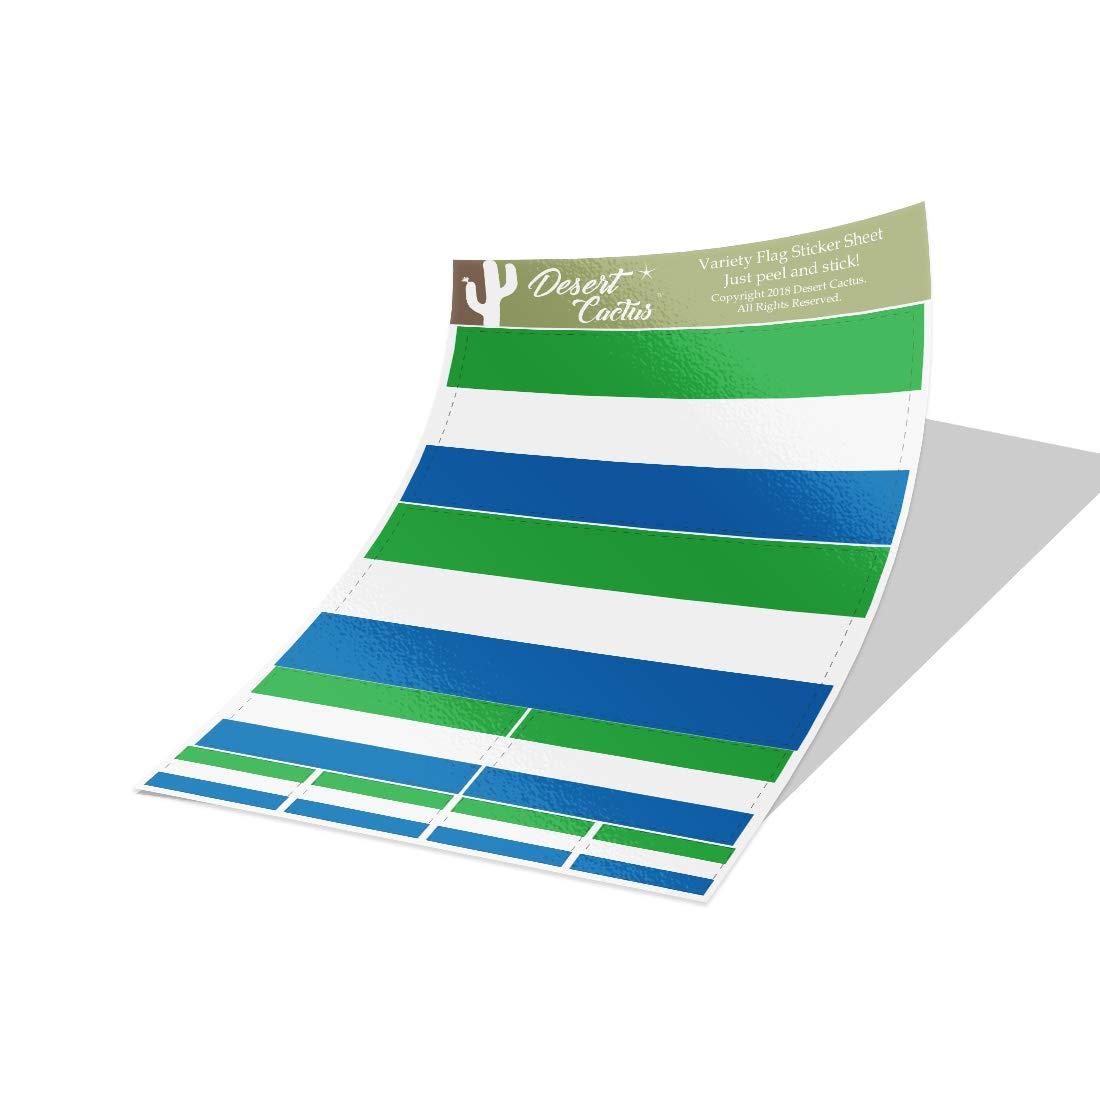 Desert Cactus Sierra Leone Country Flag Sticker Decal Variety Size Pack 8 Total Pieces Kids Logo Scrapbook Car Vinyl Window Bumper Laptop V